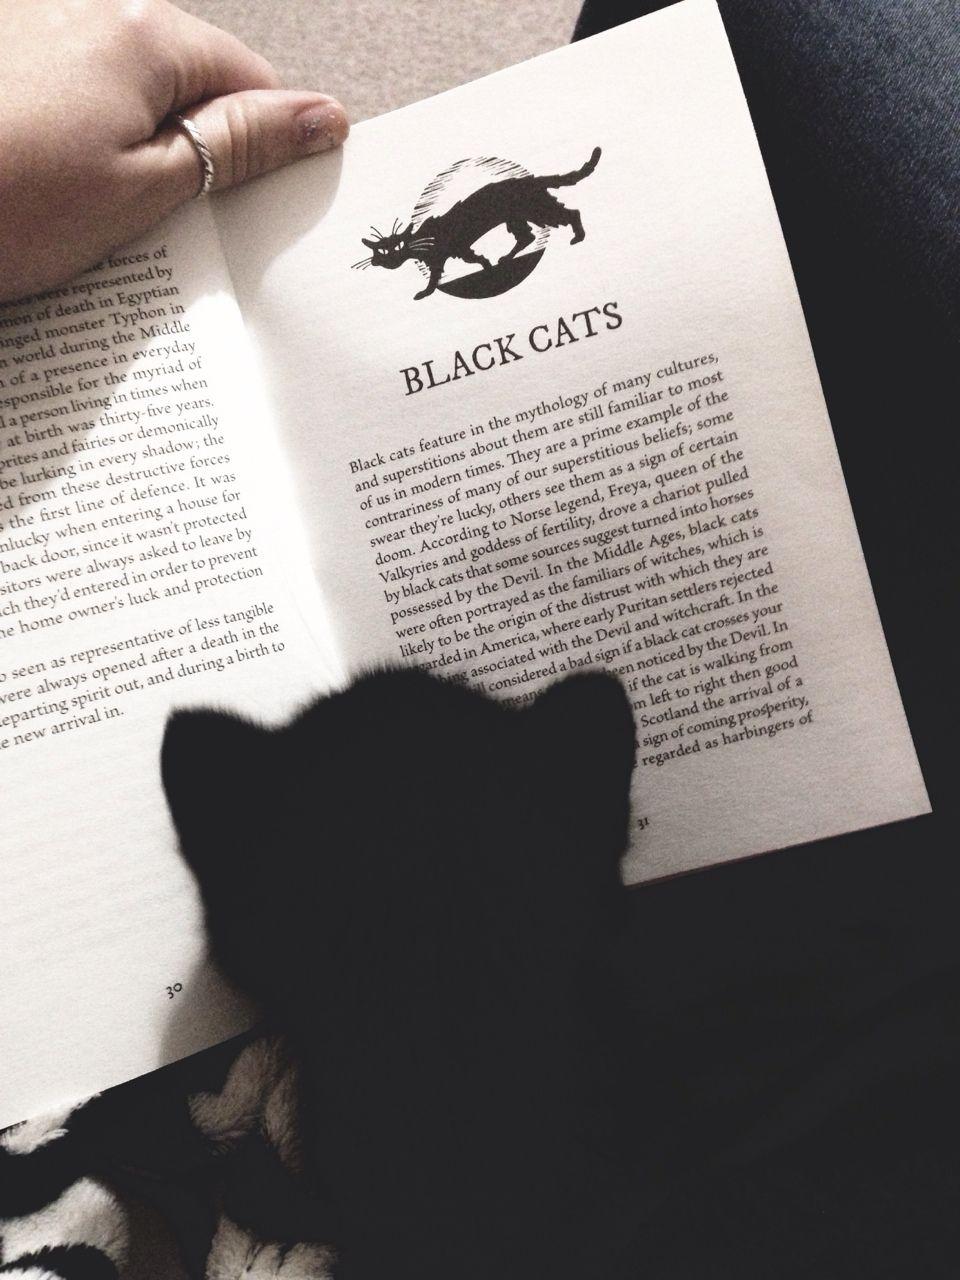 Black cat  http://www.pinterest.com/pin/461056080576325392/  ...  http://www.pinterest.com/pin/461056080575473473/